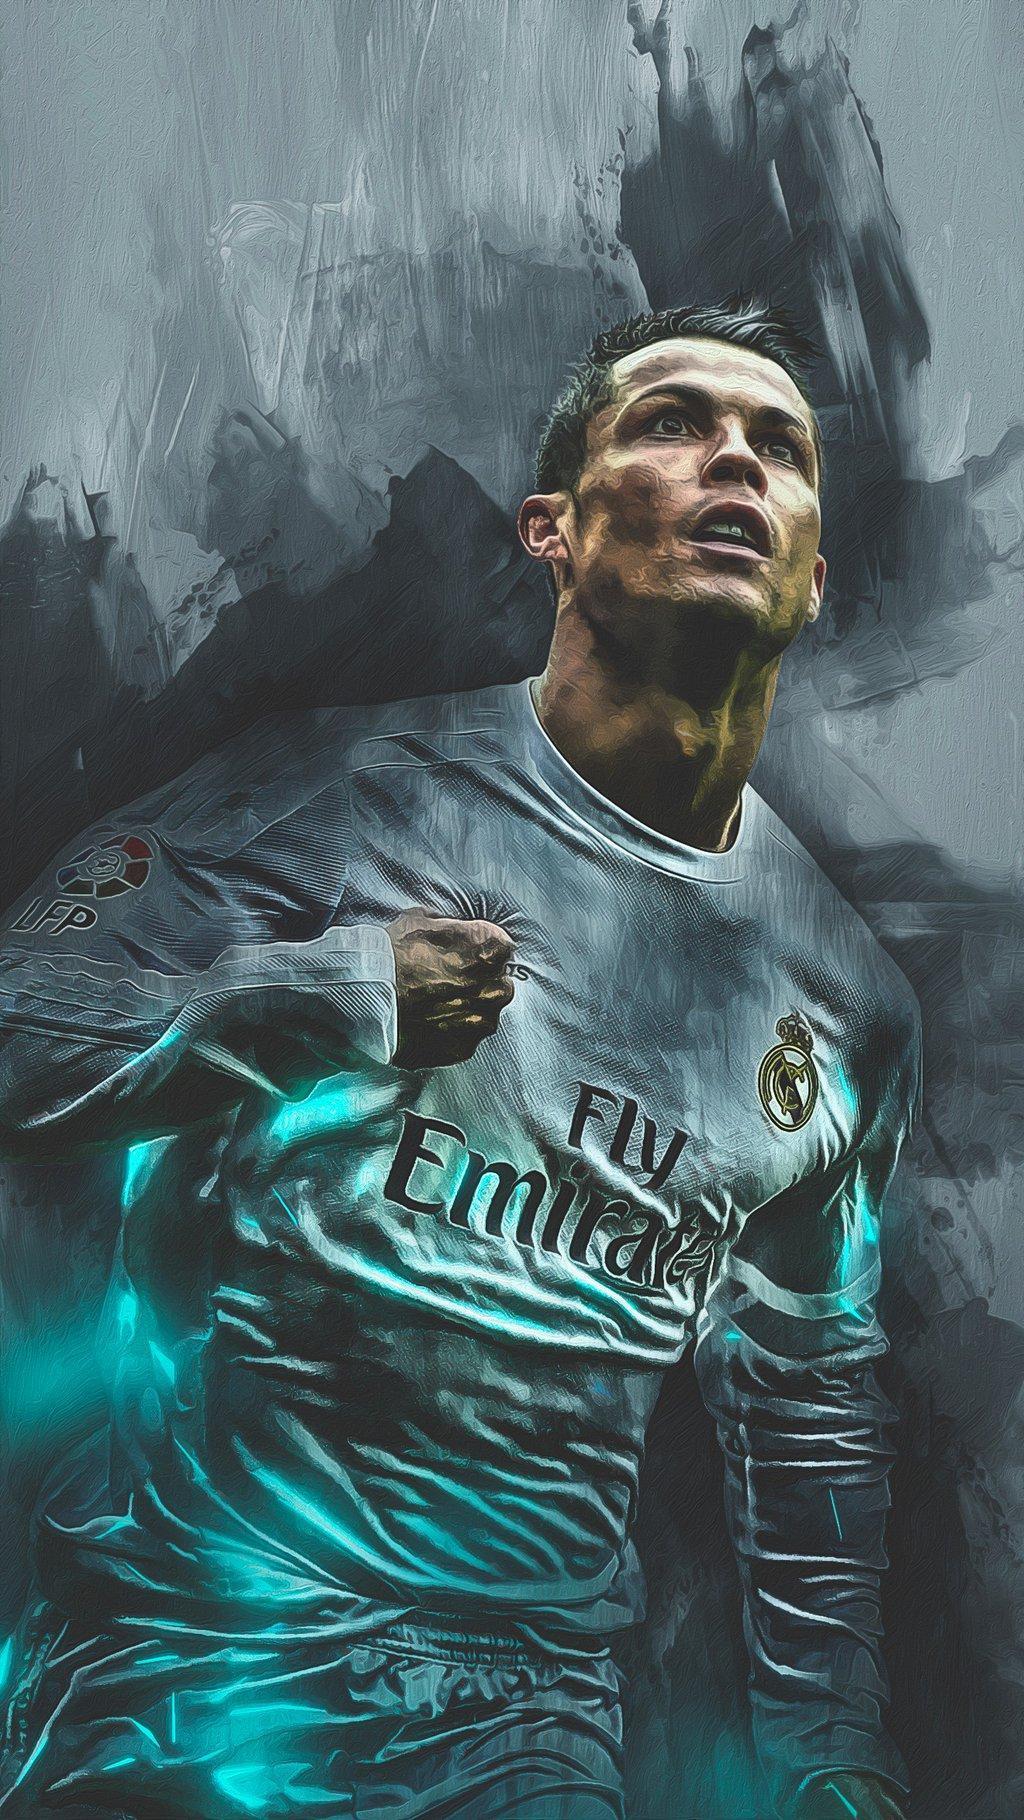 Cristiano Ronaldo Cr7 Wallpaper Mobile 4k For Android Apk Download